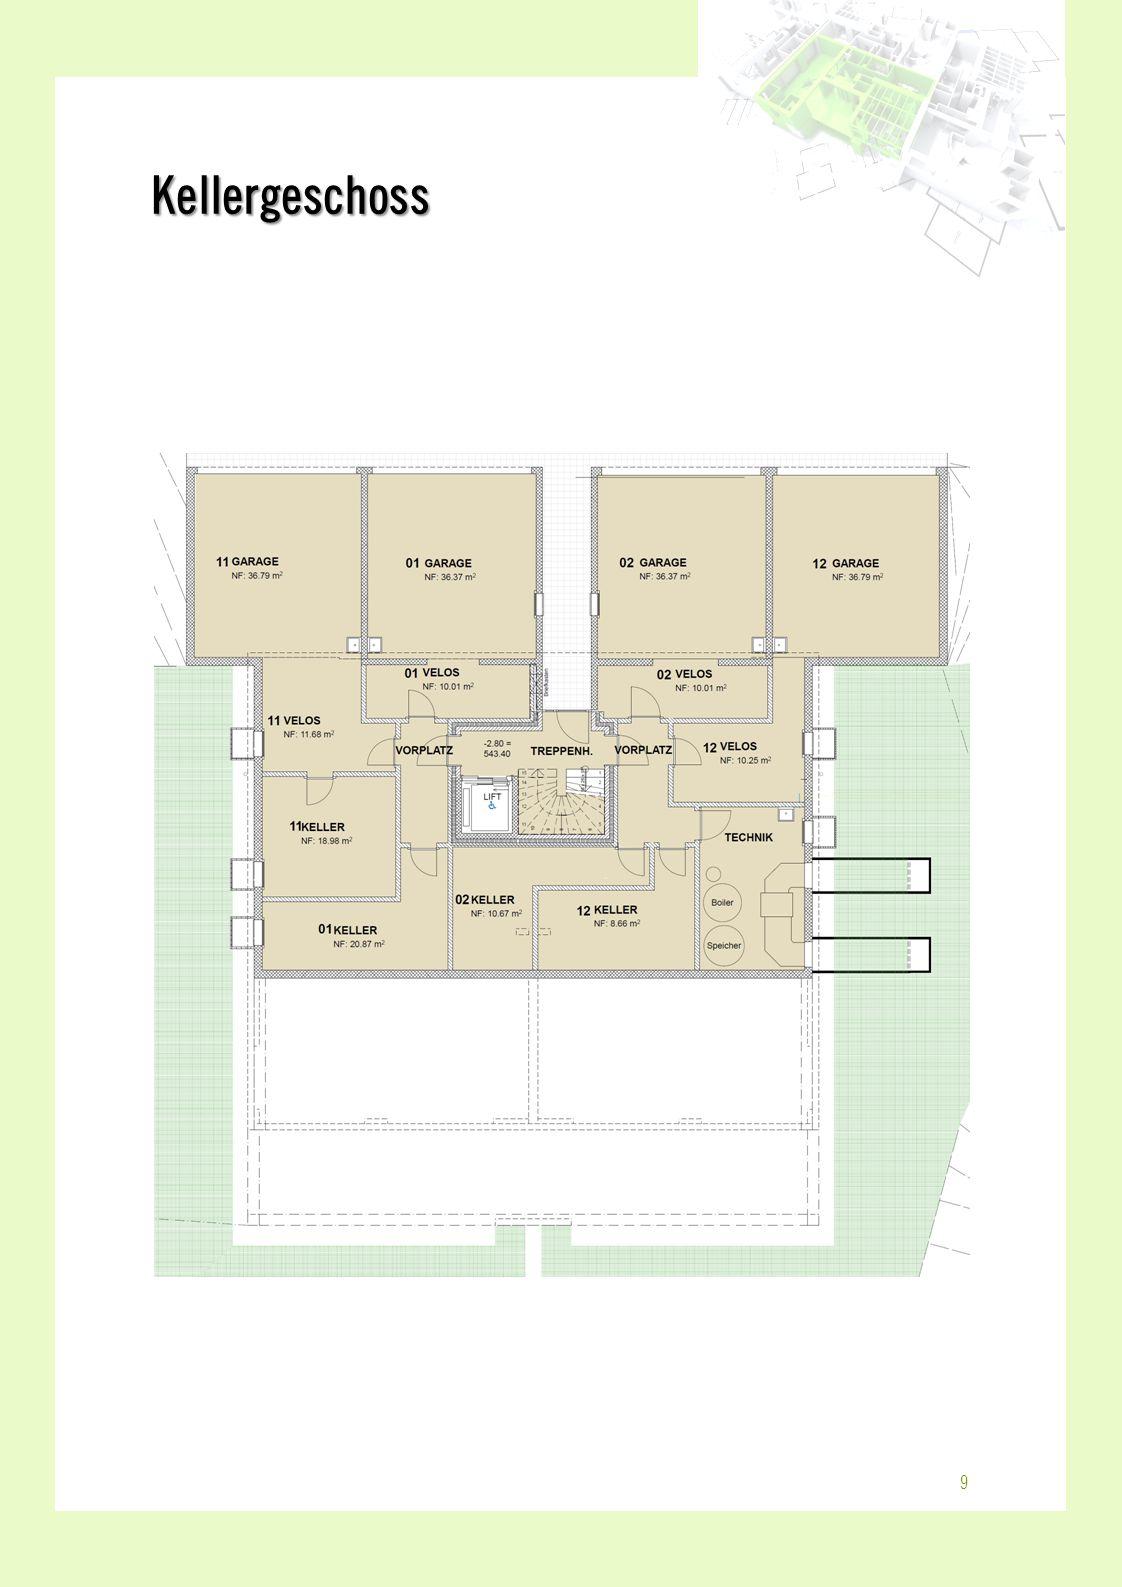 Kellergeschoss 9